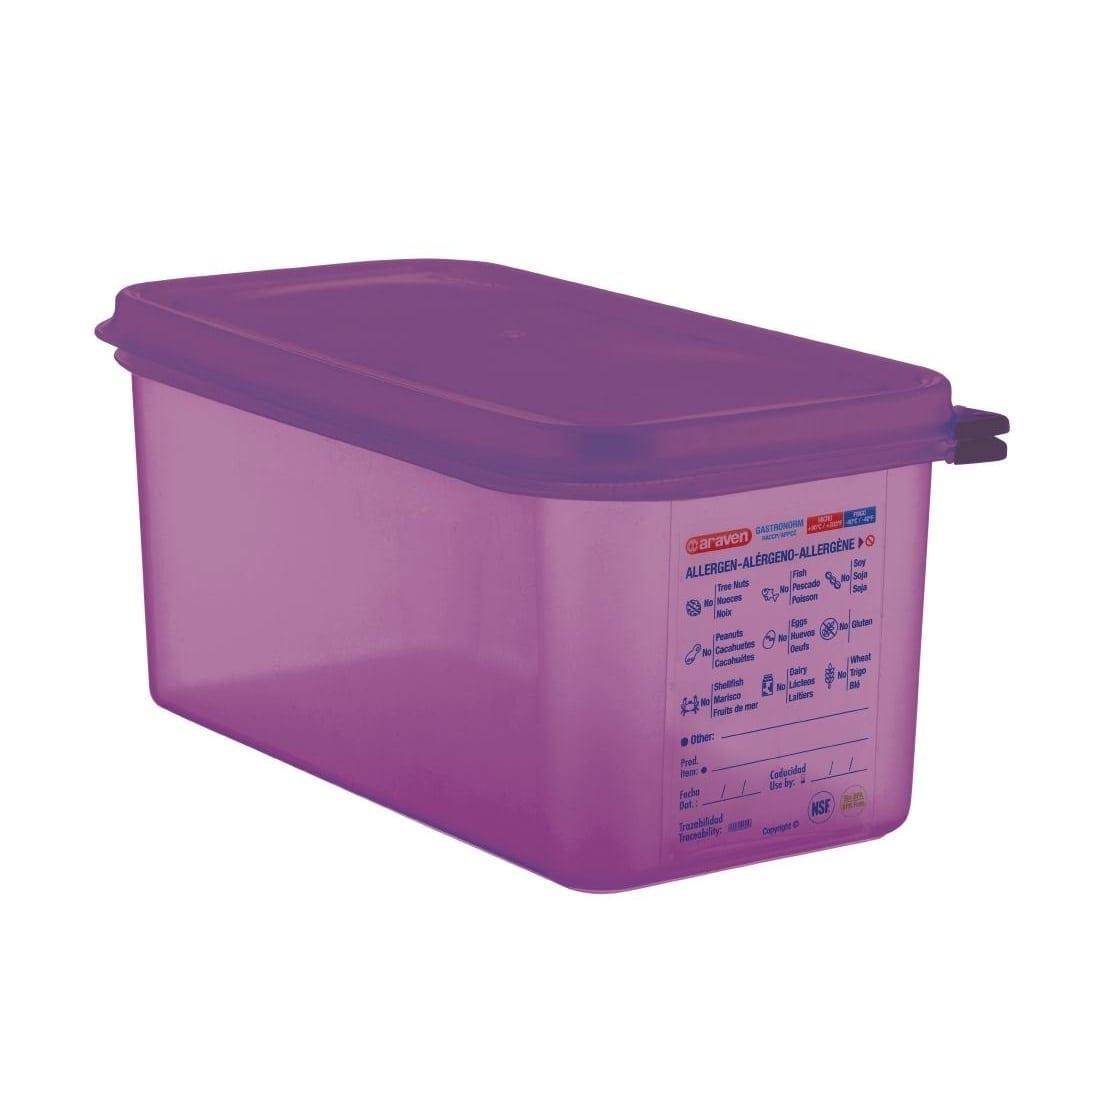 Araven Allergen Container GN - 1/3 6Ltr & Airtight Lid-0